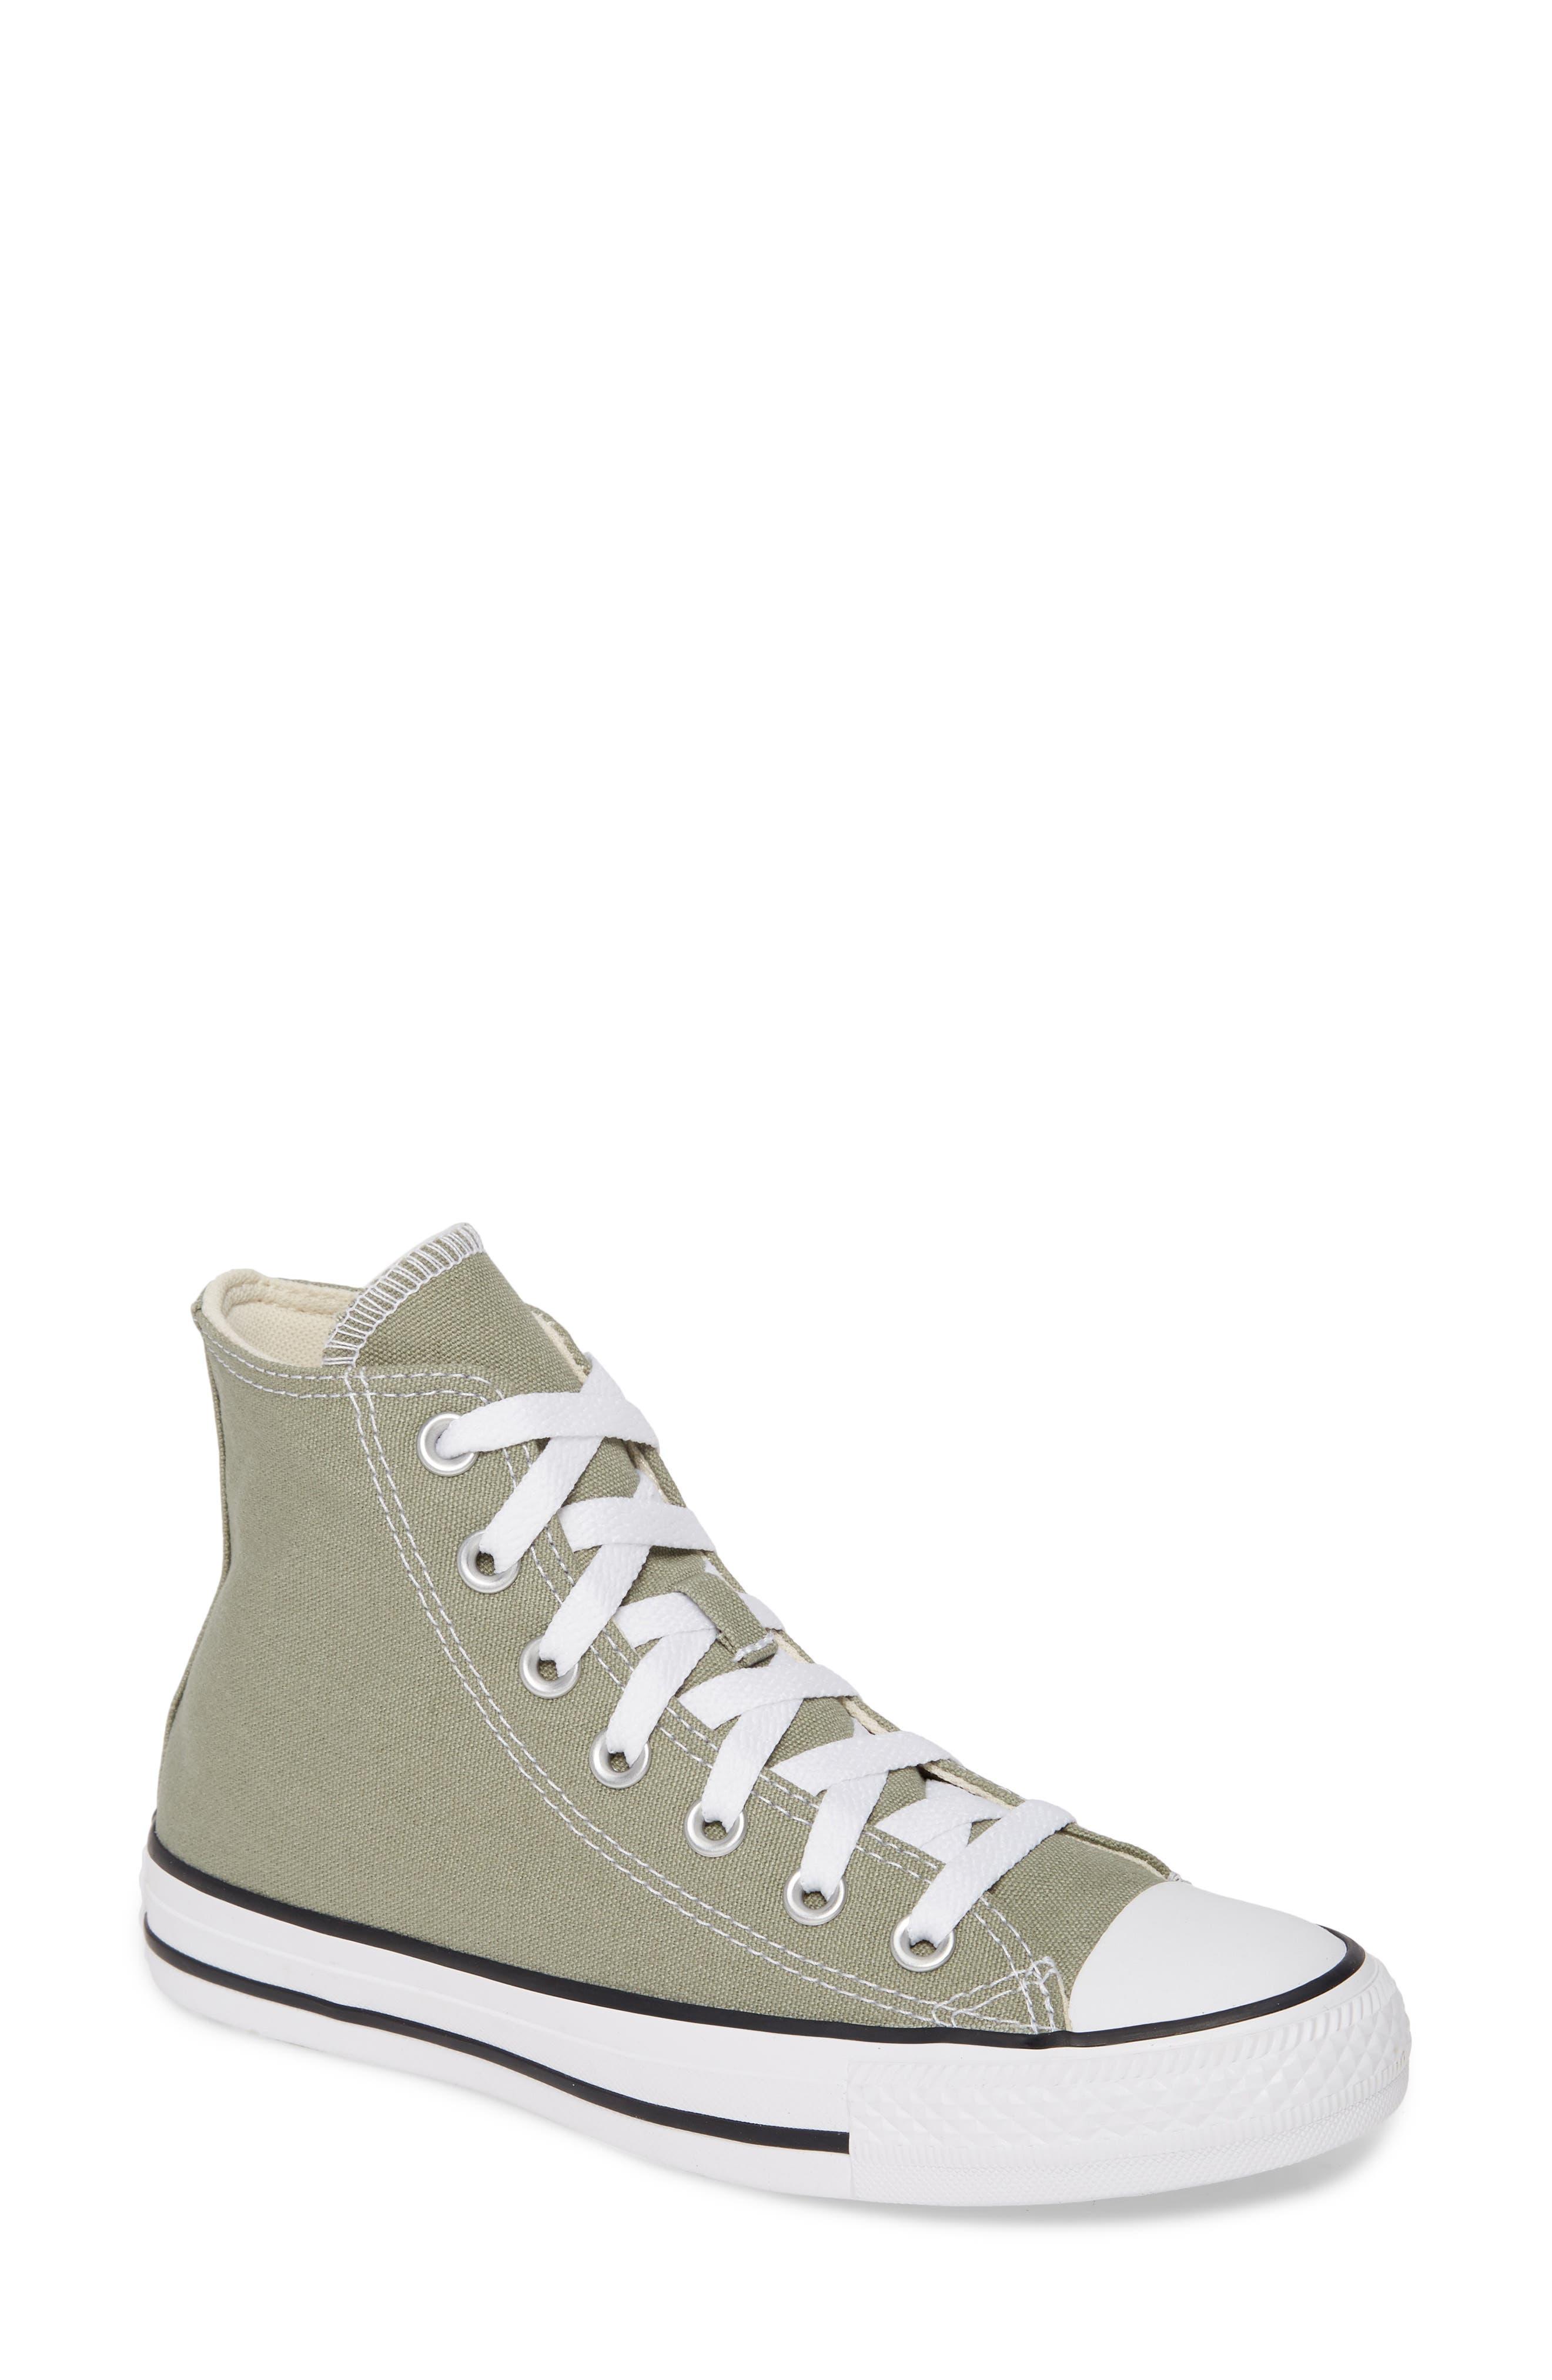 Converse Chuck Taylor All Star Seasonal Hi Sneaker- Green